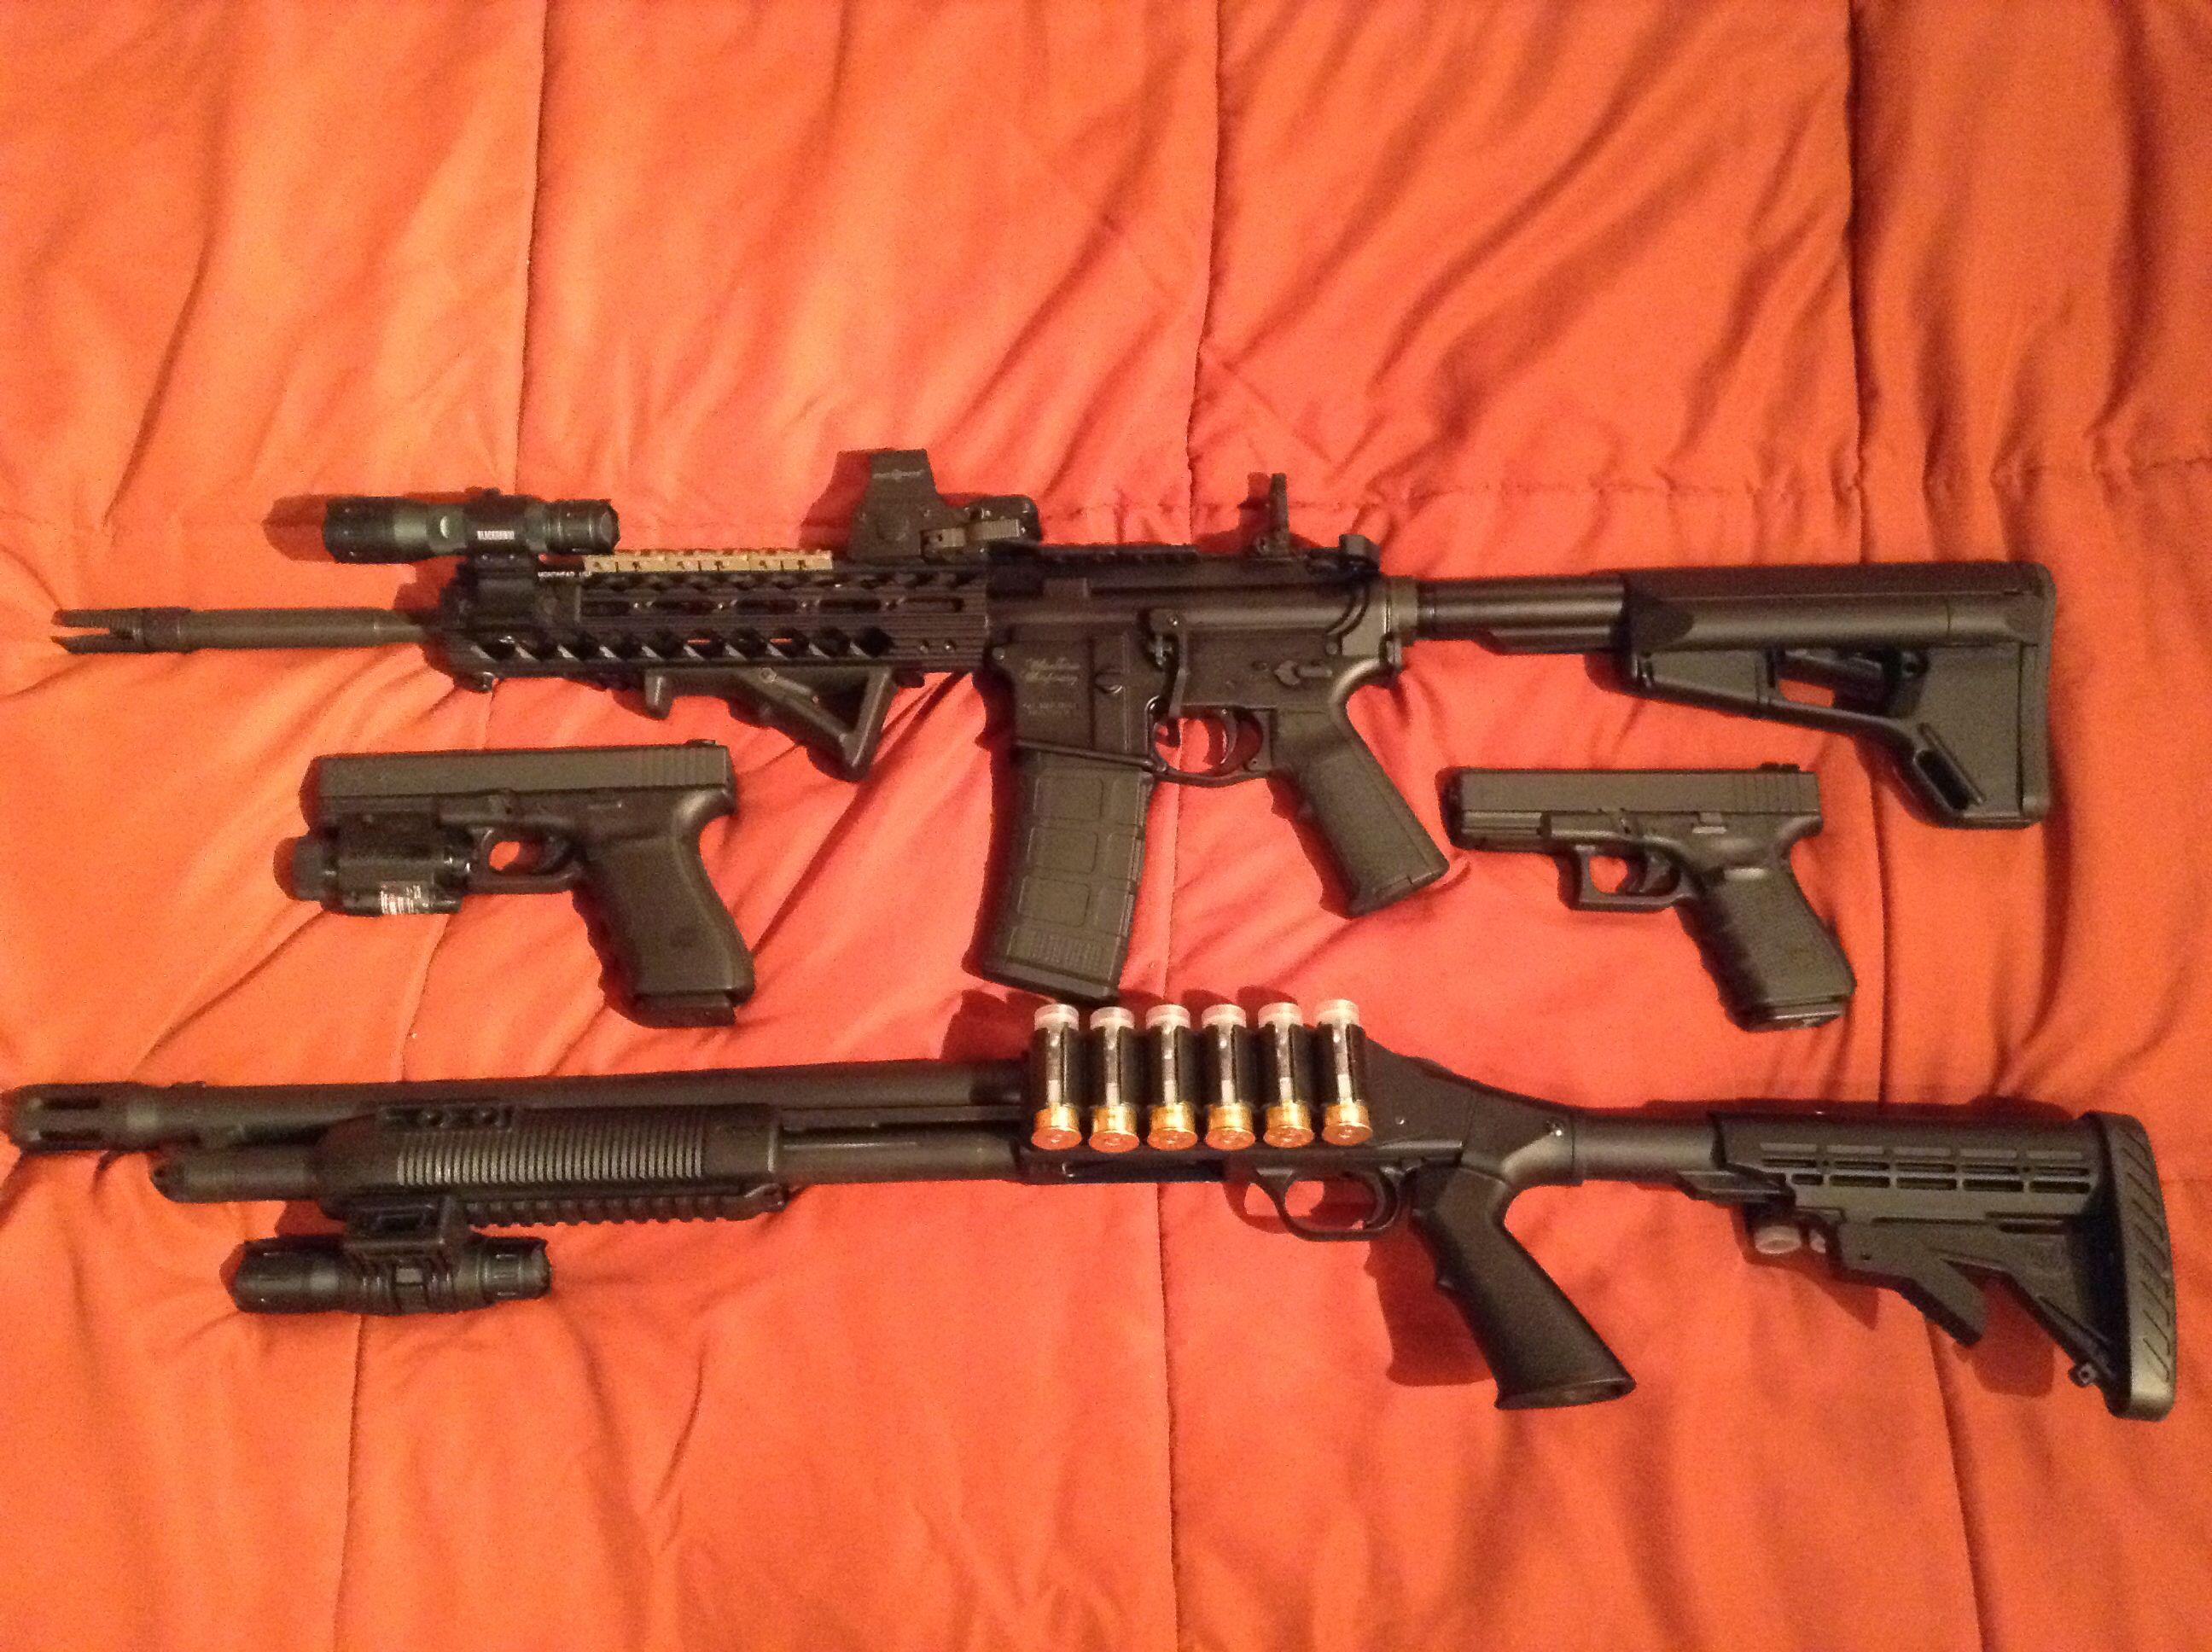 Windham Weaponry CDI, Mossberg 500 Thunder Ranch, Glock 21 Gen 4 ...